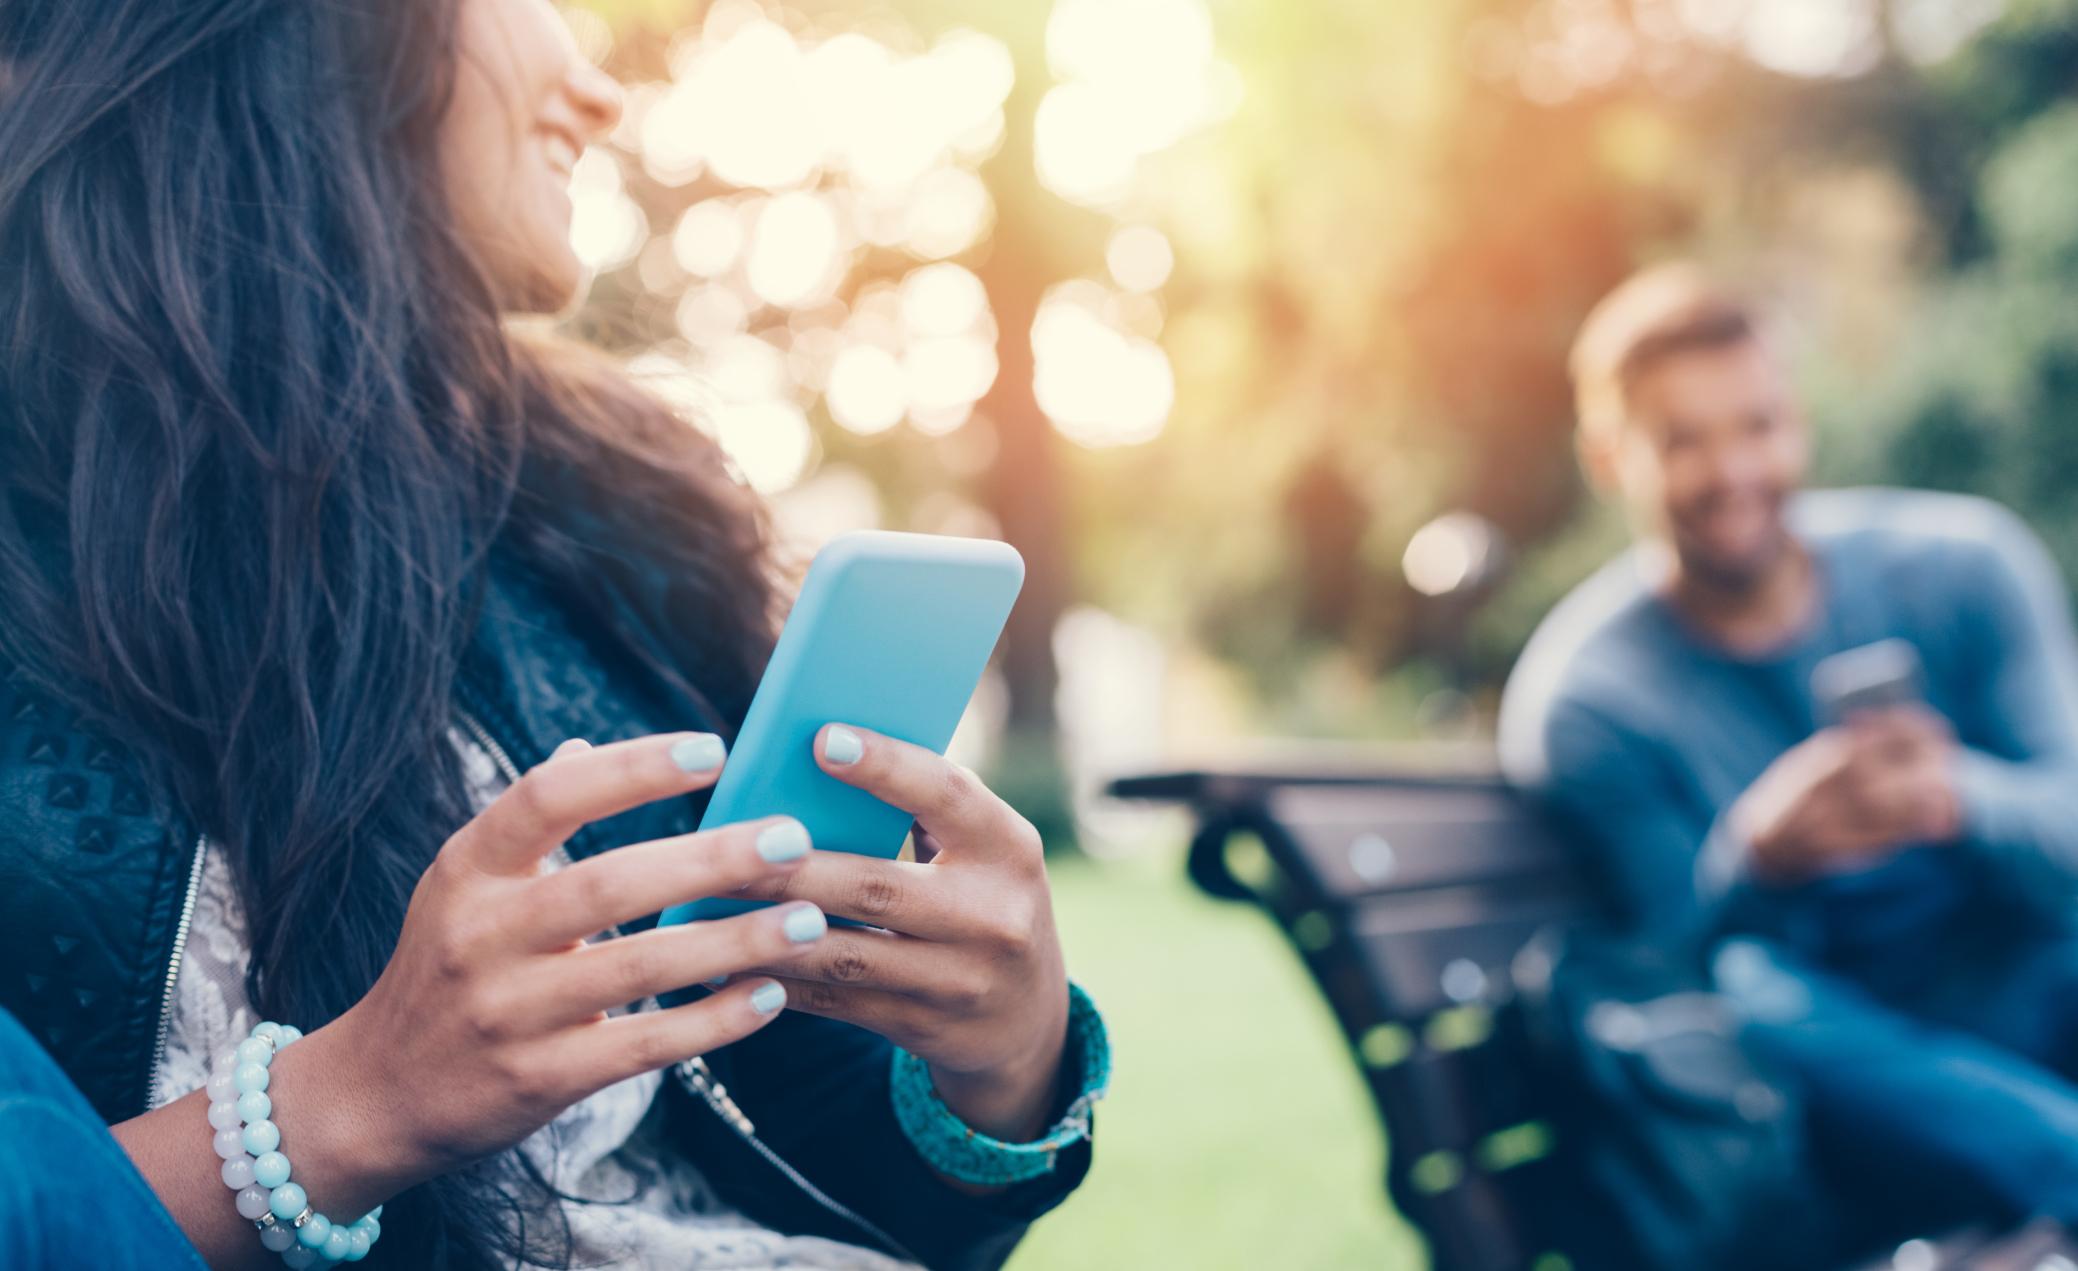 Dating in the Digital Era #Savant - Photo: Sheknows.com